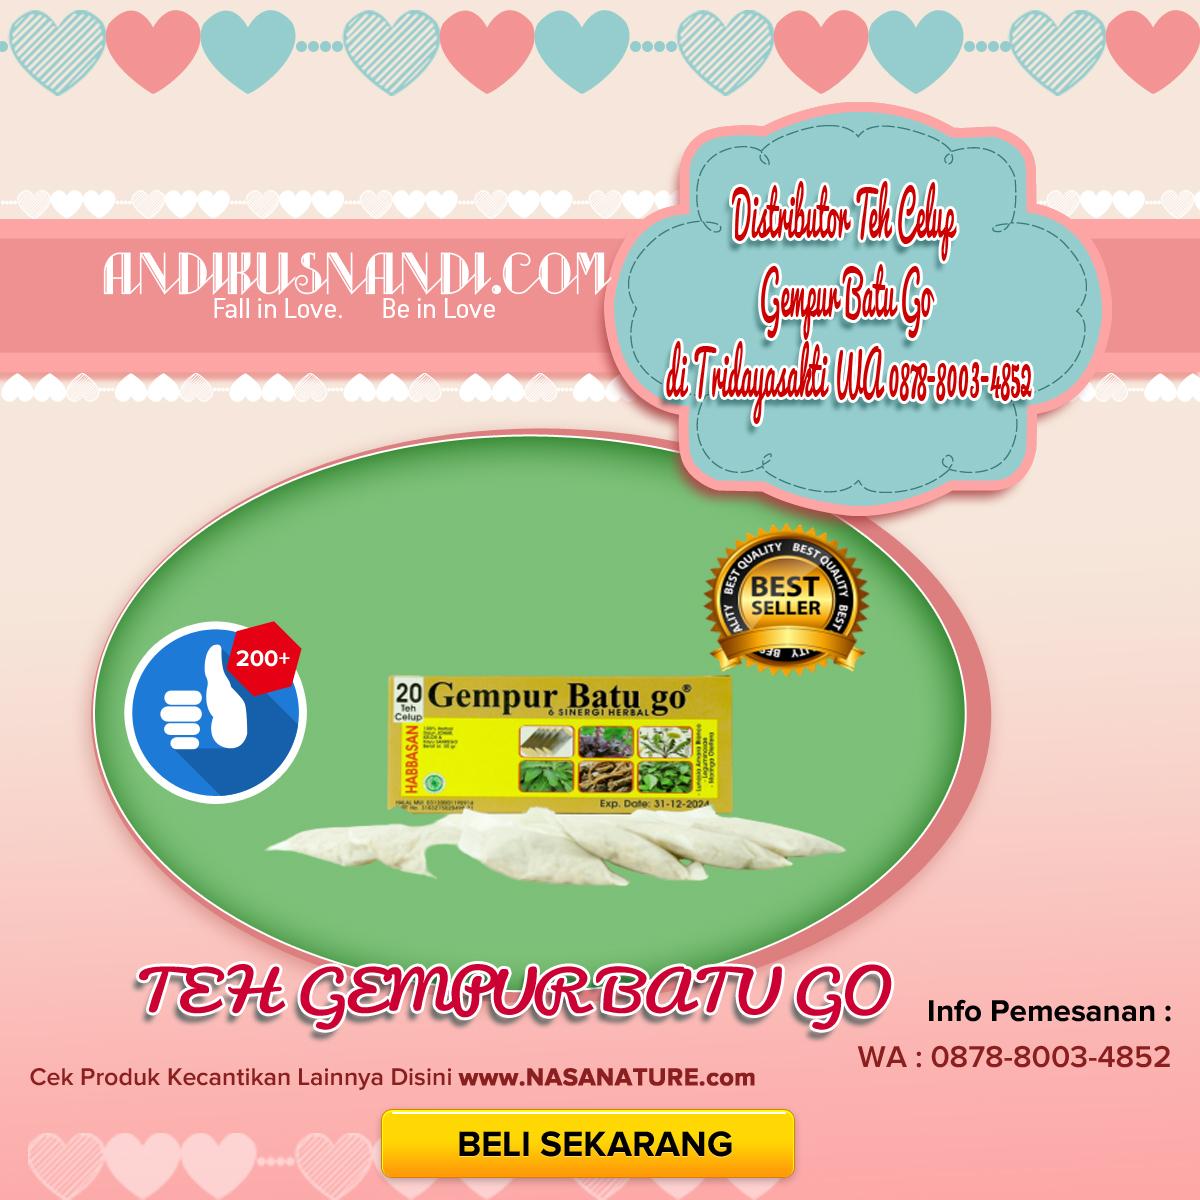 Distributor Teh Celup Gempur Batu Go di Tridayasakti WA 0878-8003-4852